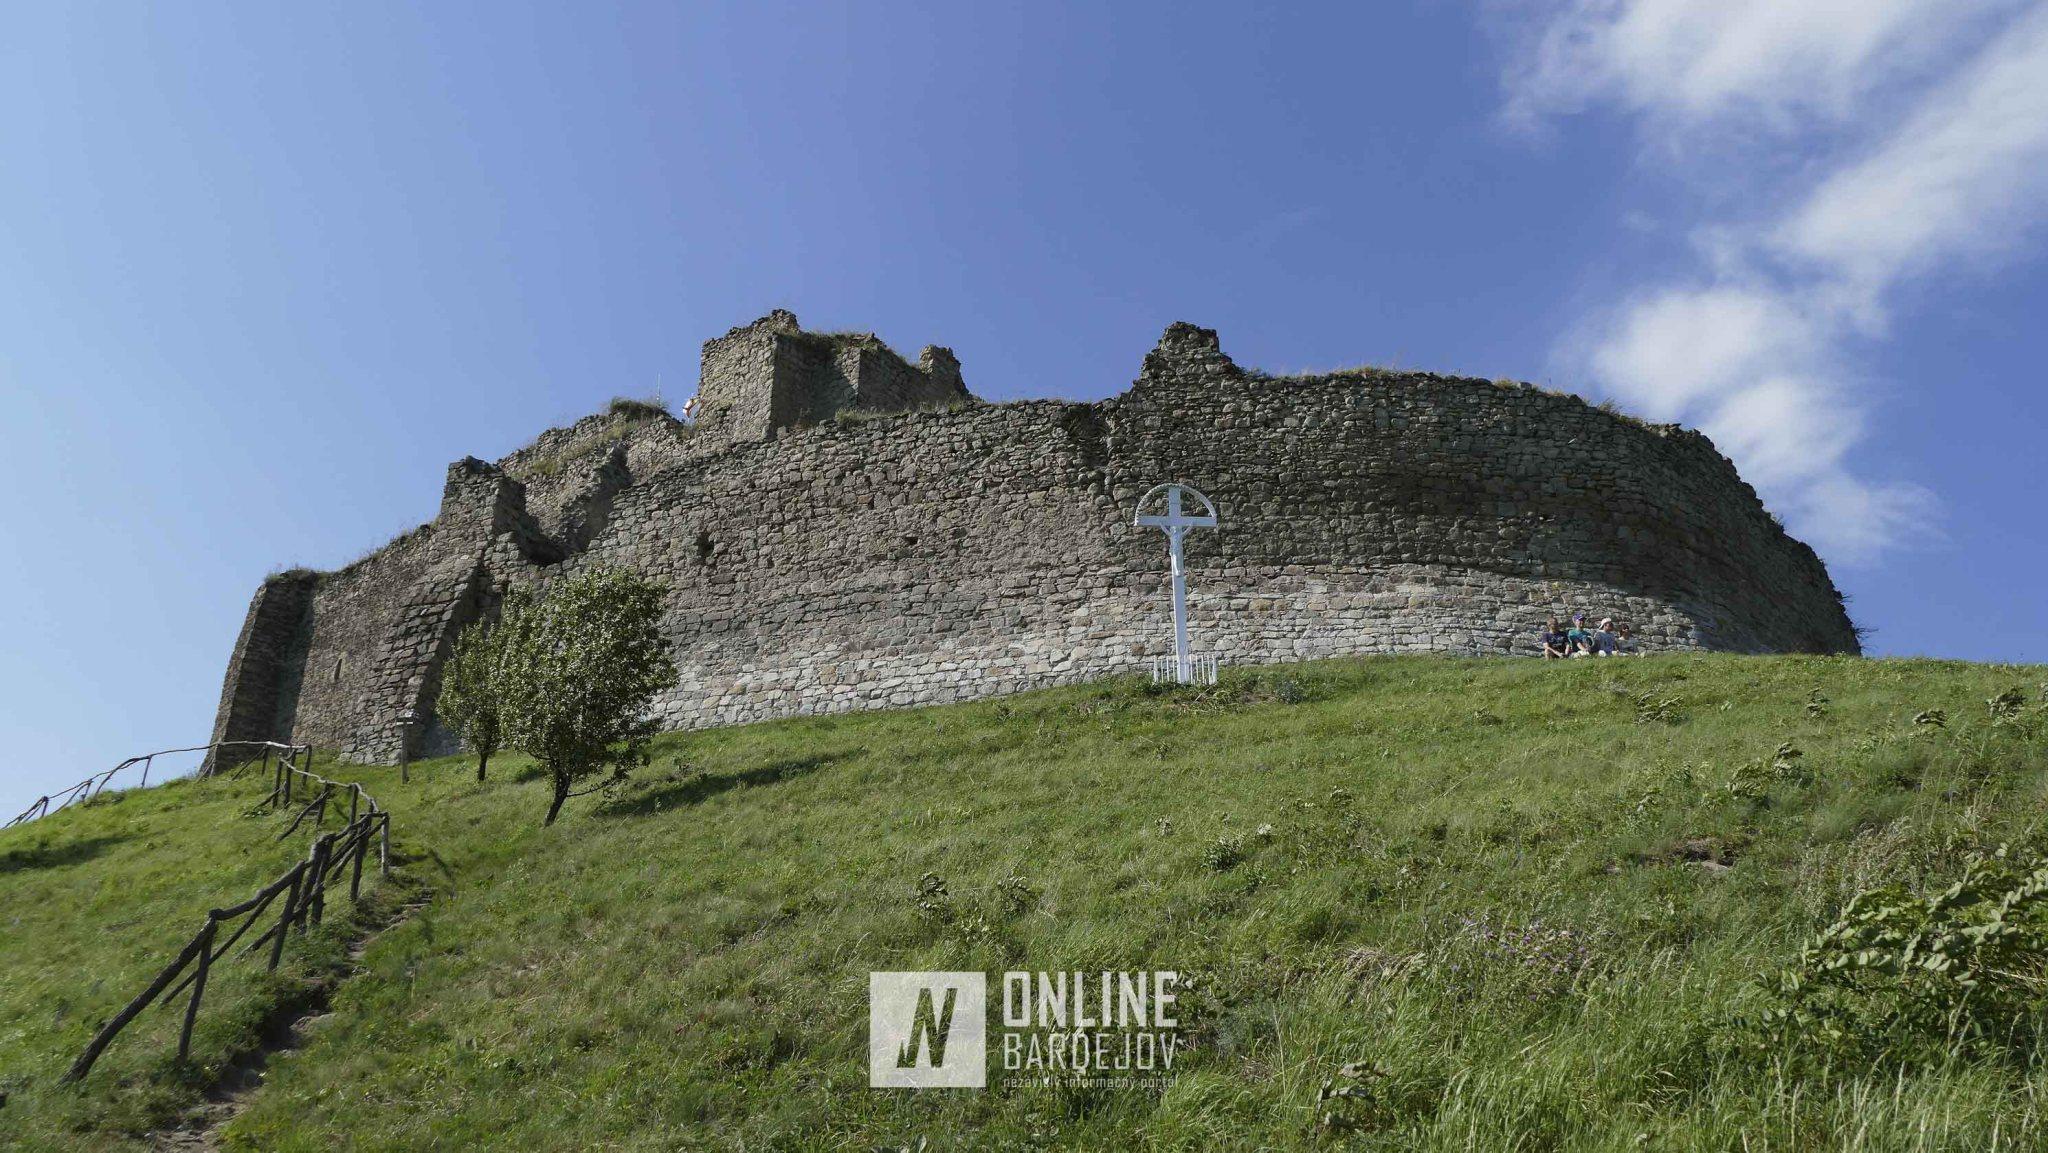 TIP NA VÝLET: Kapušiansky hrad je na skok od Bardejova